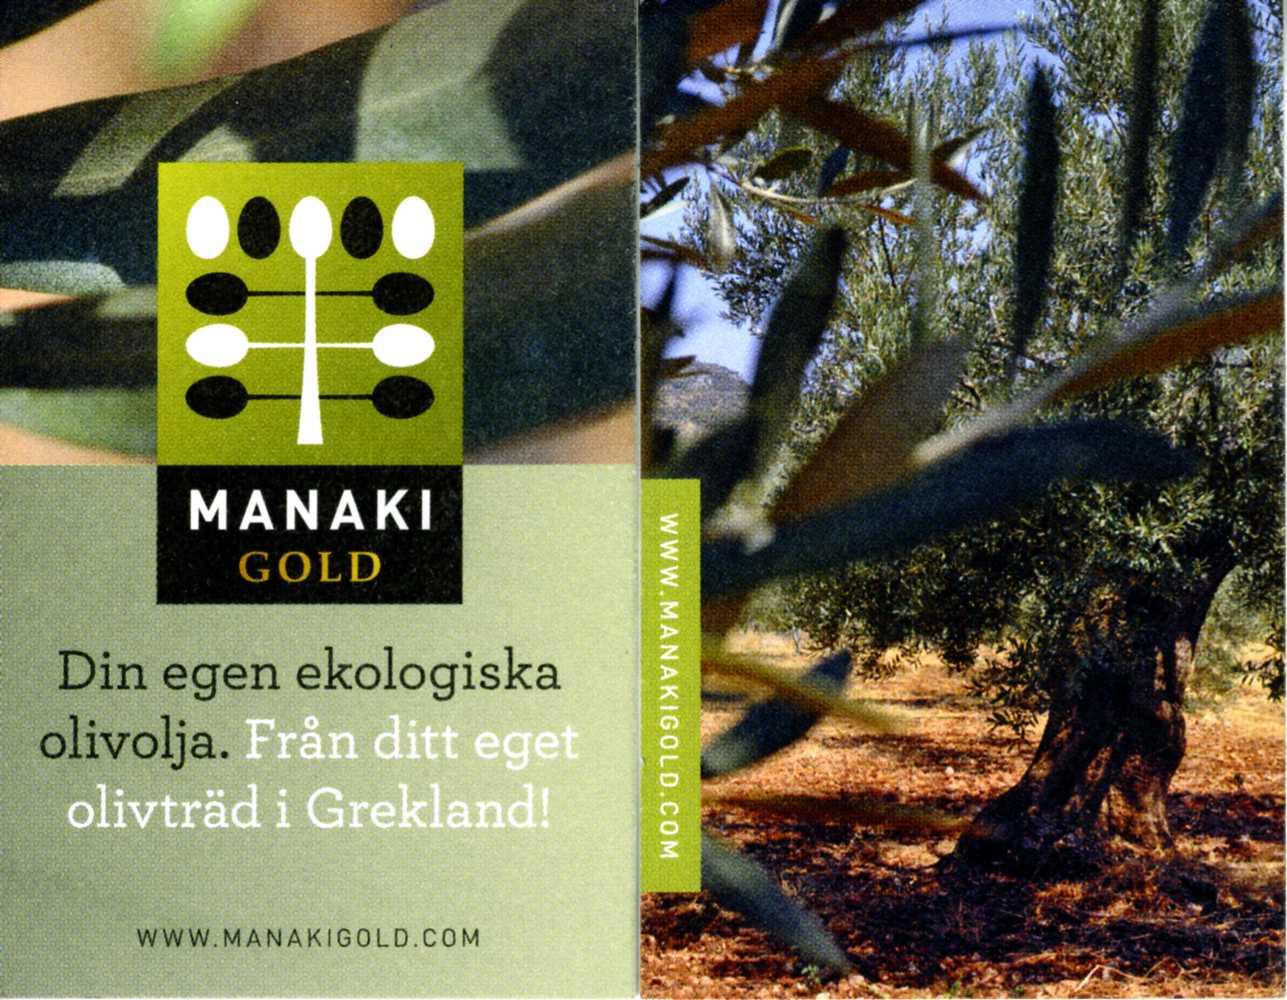 Manaki001